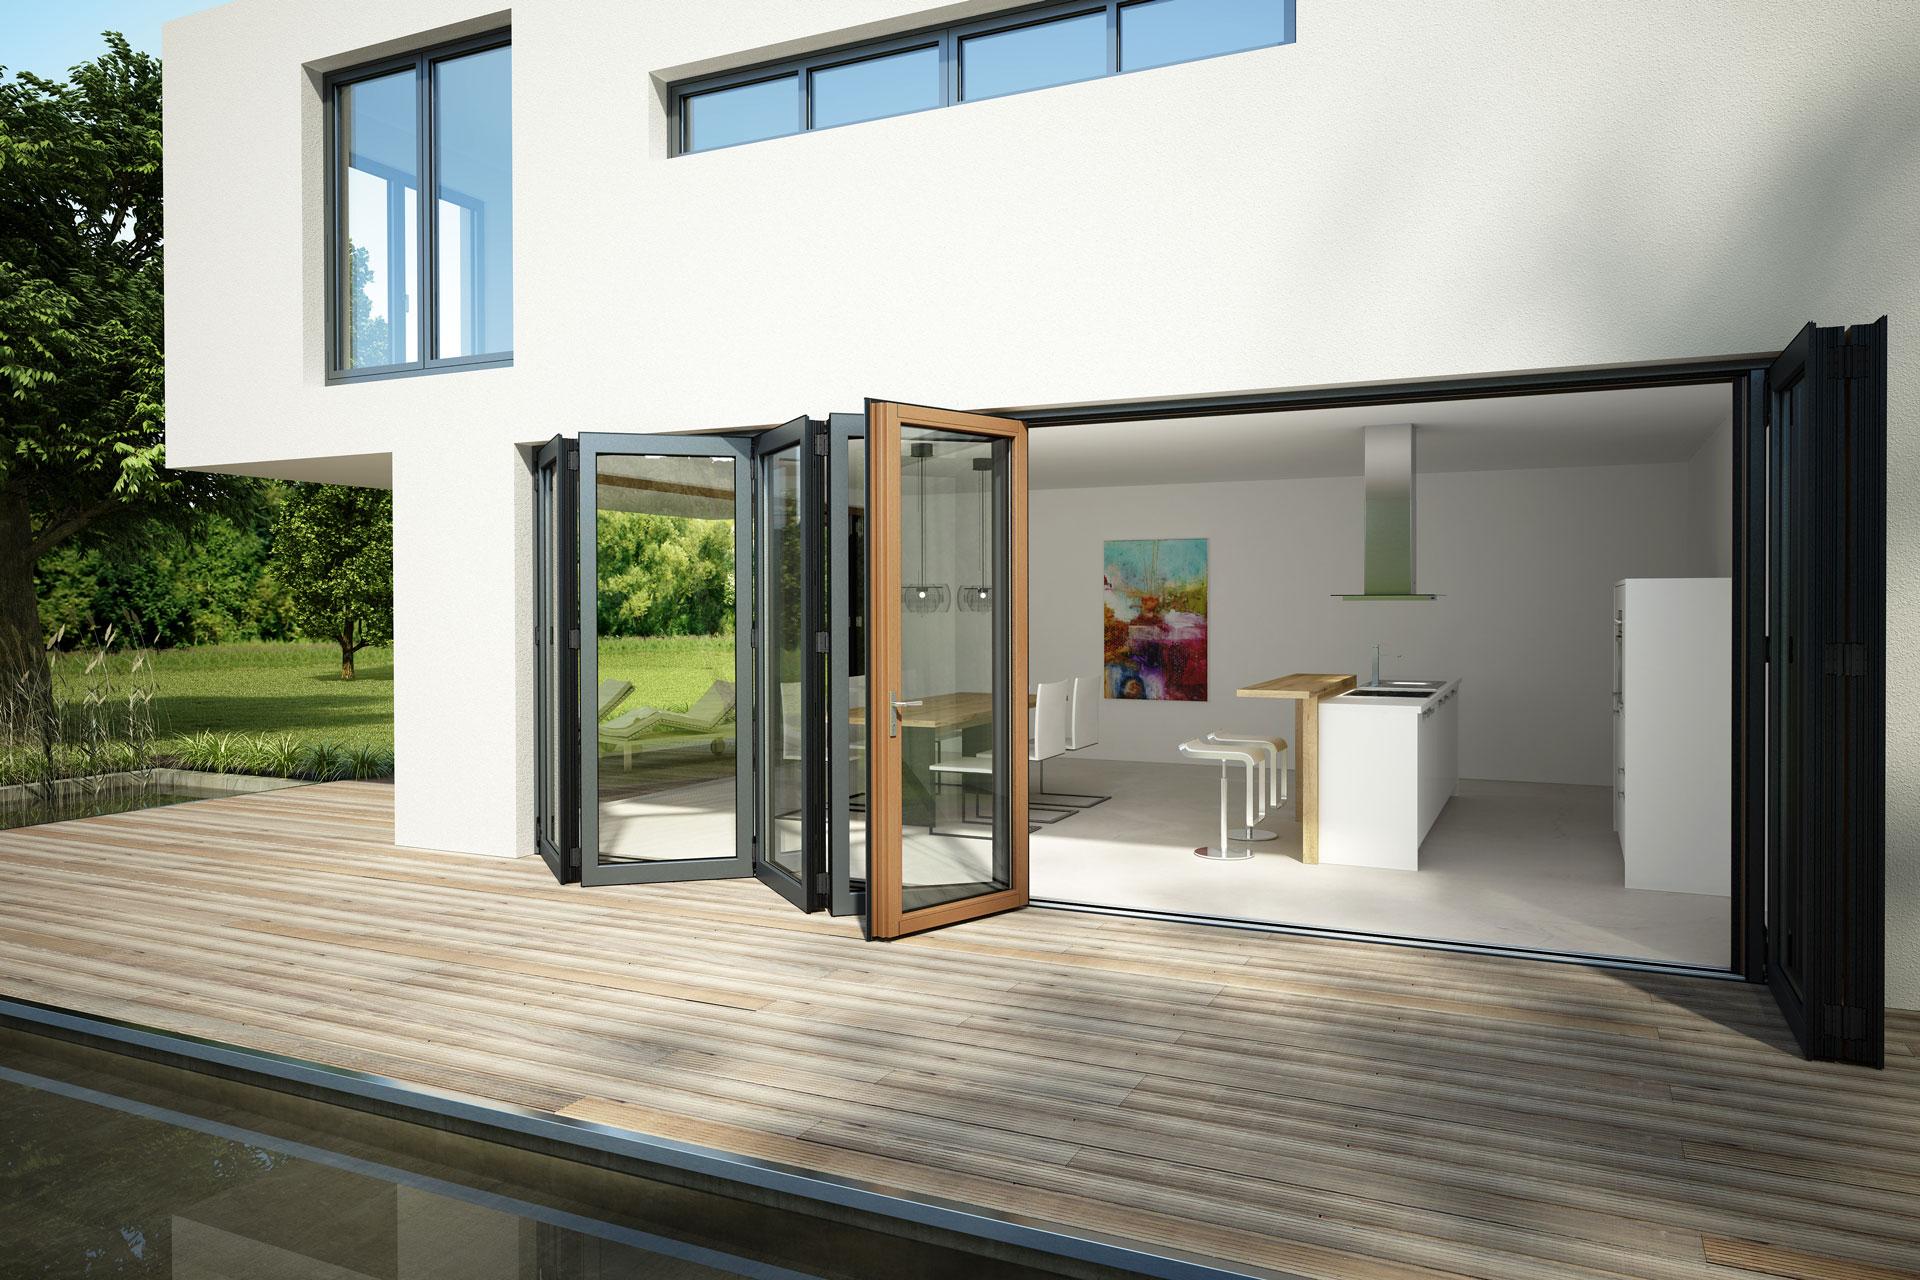 Faltwand 07 a | Verglasung bei modernem Haus mit Zieharmonika-Effekt | Svoboda Metalltechnik